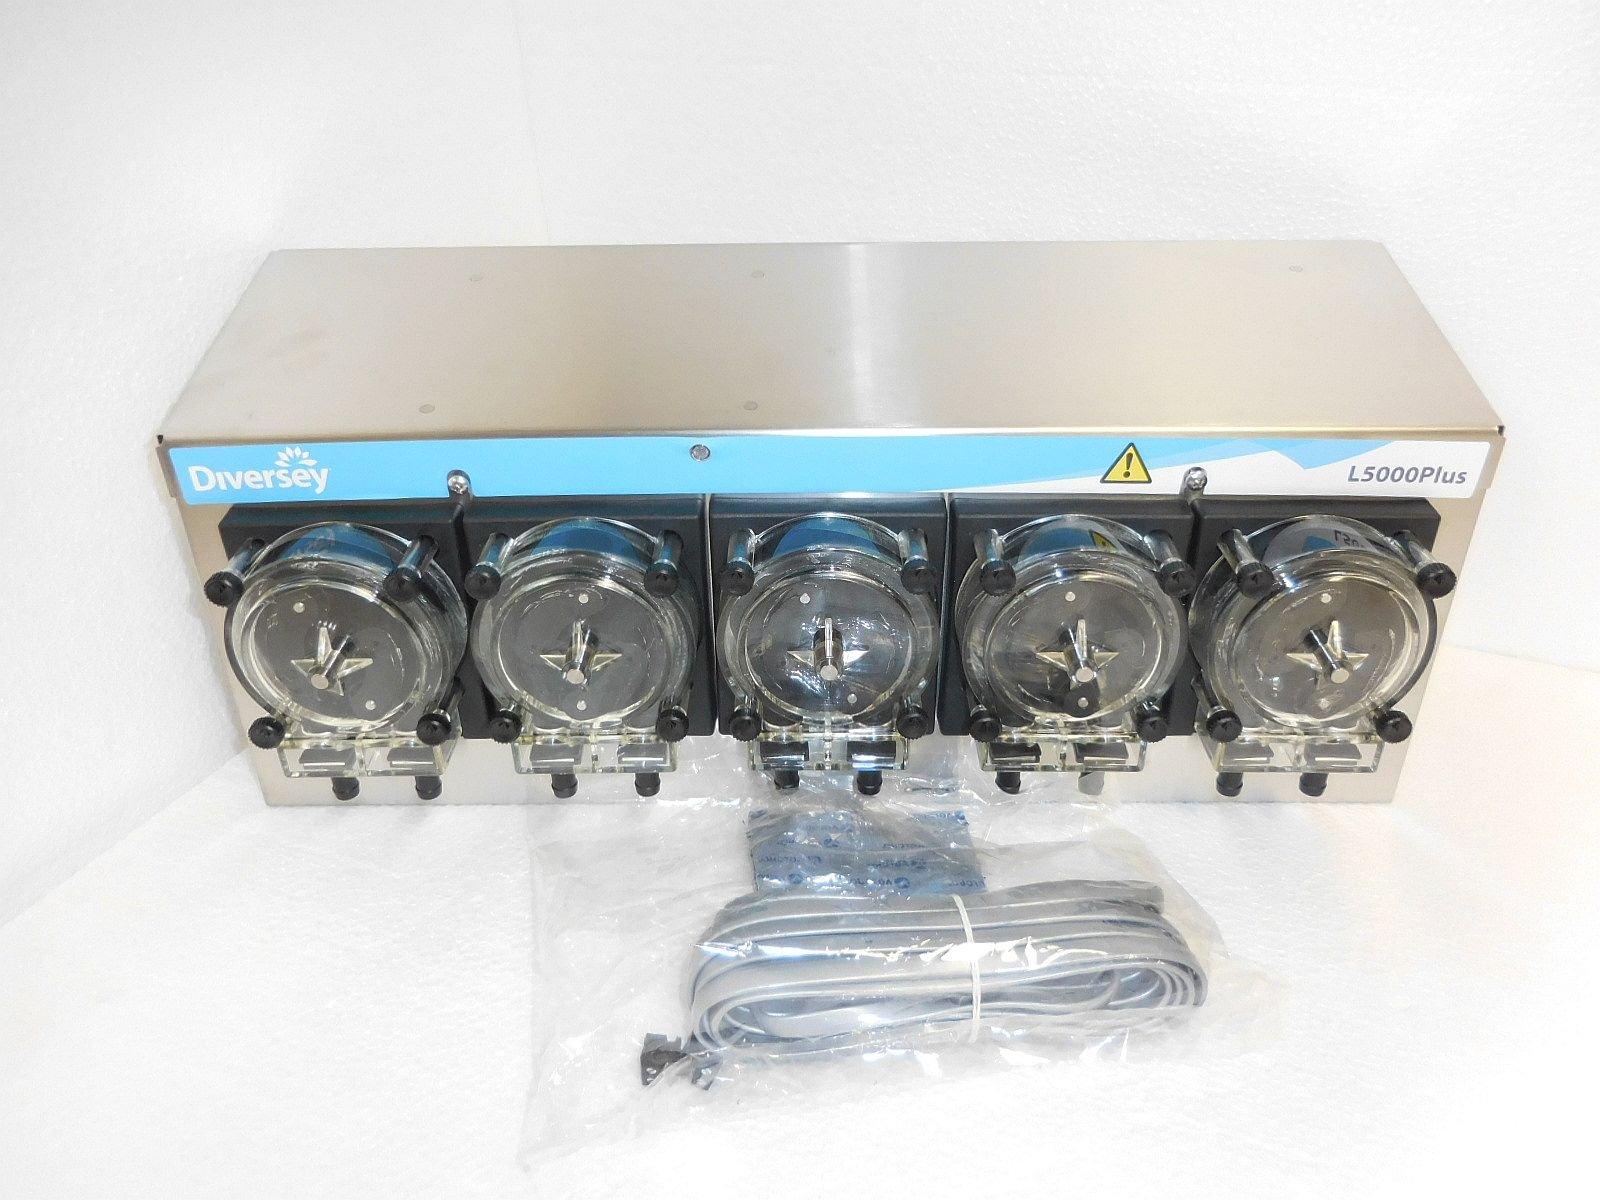 Diversey L5000 Plus Laundry Dosing System, 5 Pumps, New